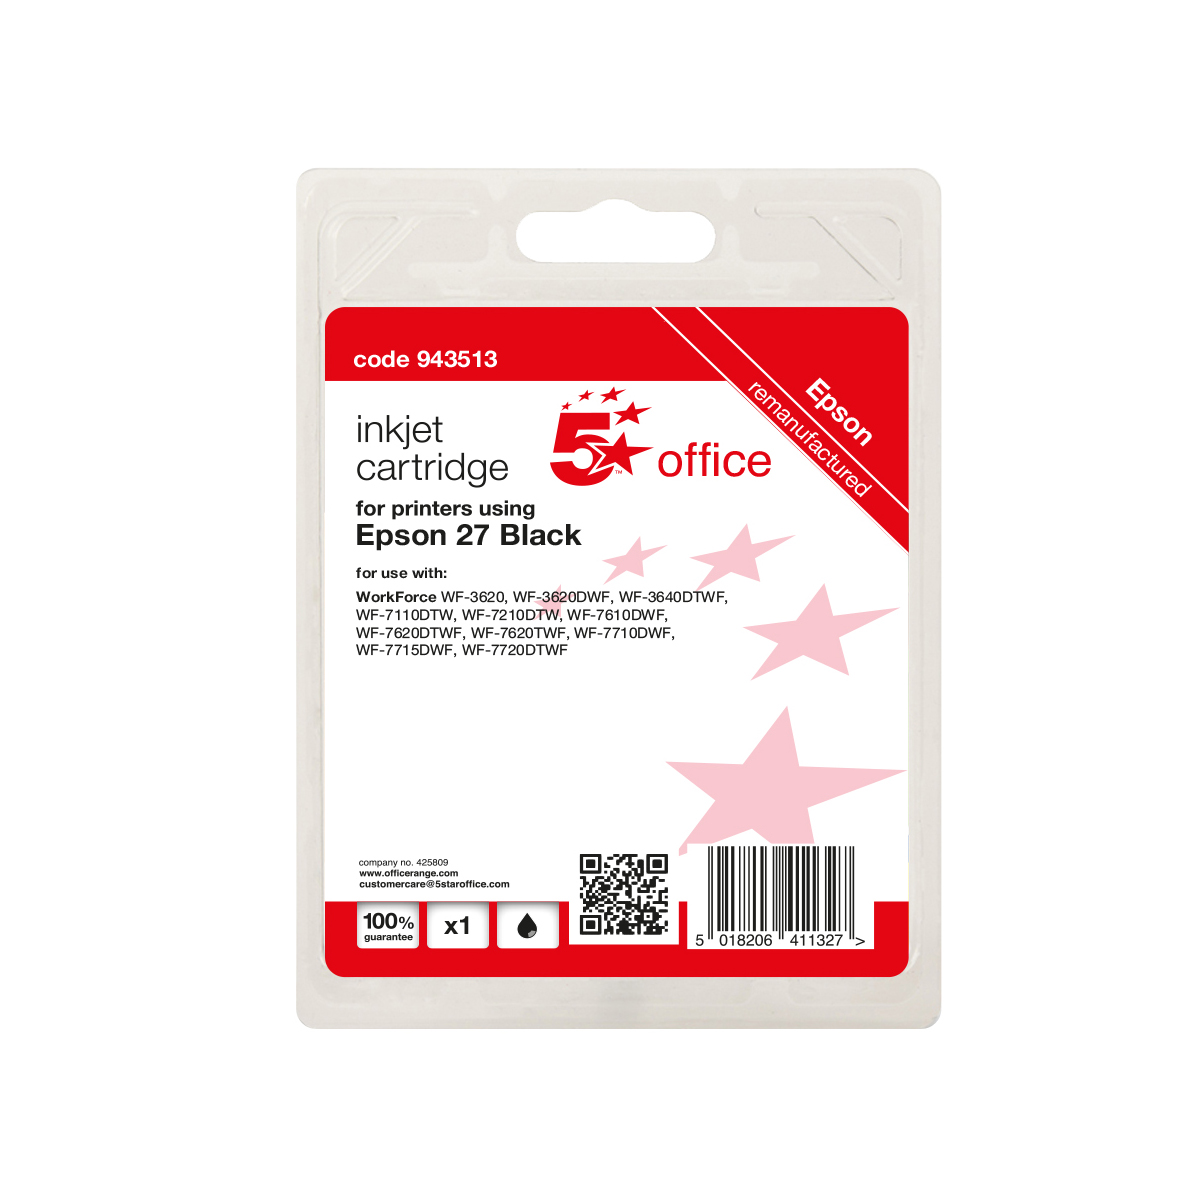 Ink cartridges 5 Star Office Remanufactured Inkjet Cartridge Black Epson 27 Alternative